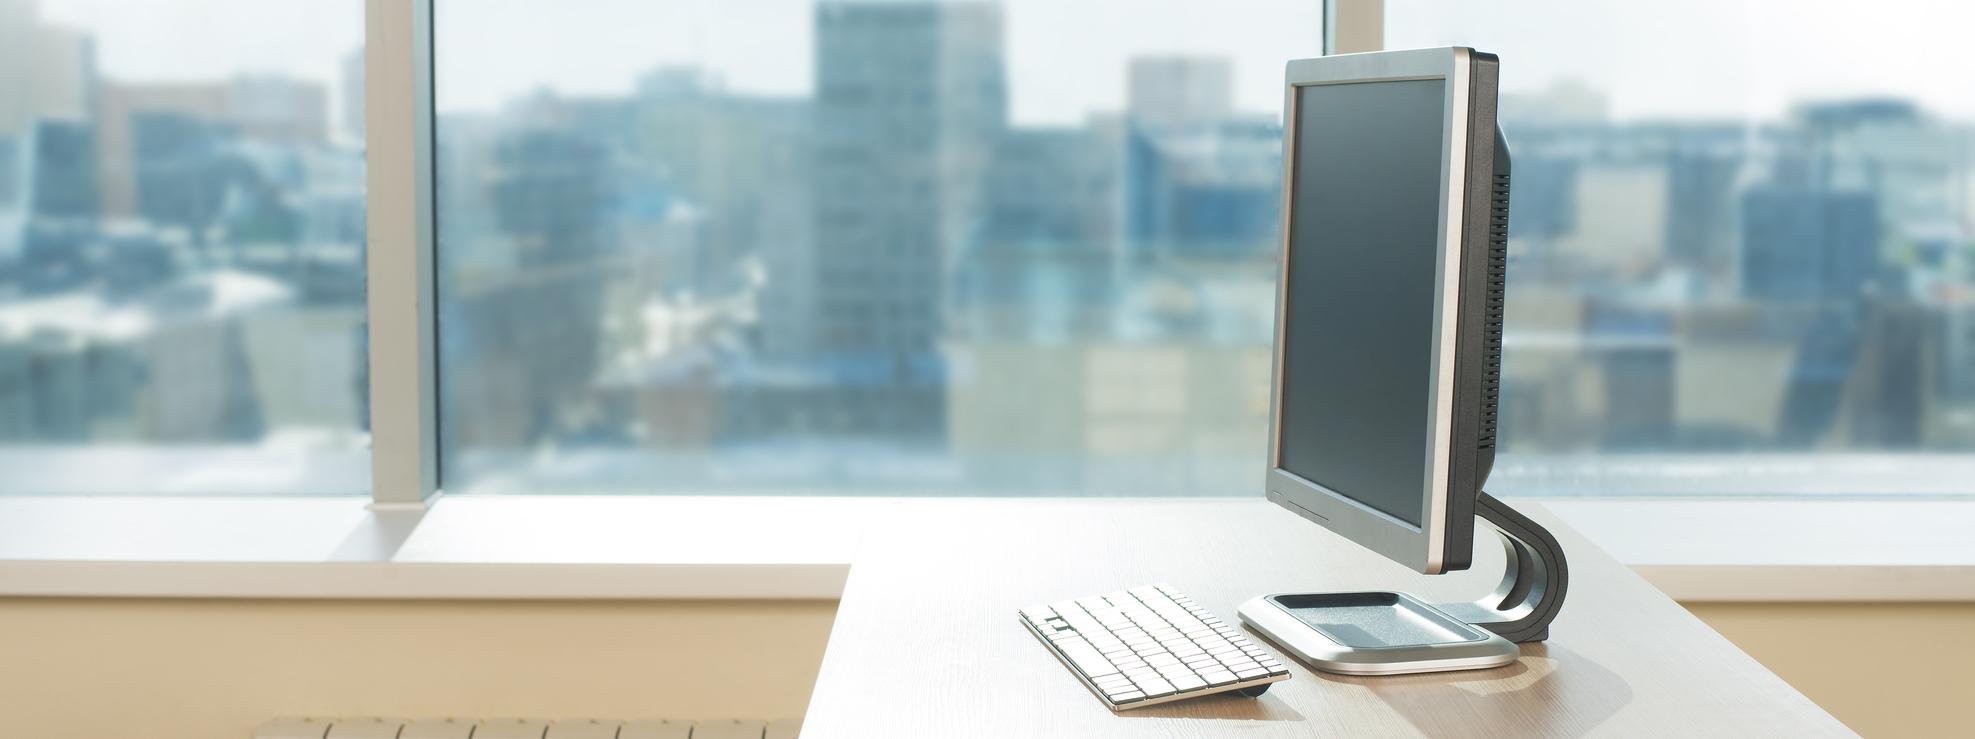 Charlotte Digital Marketing Services | Internet Marketing NC